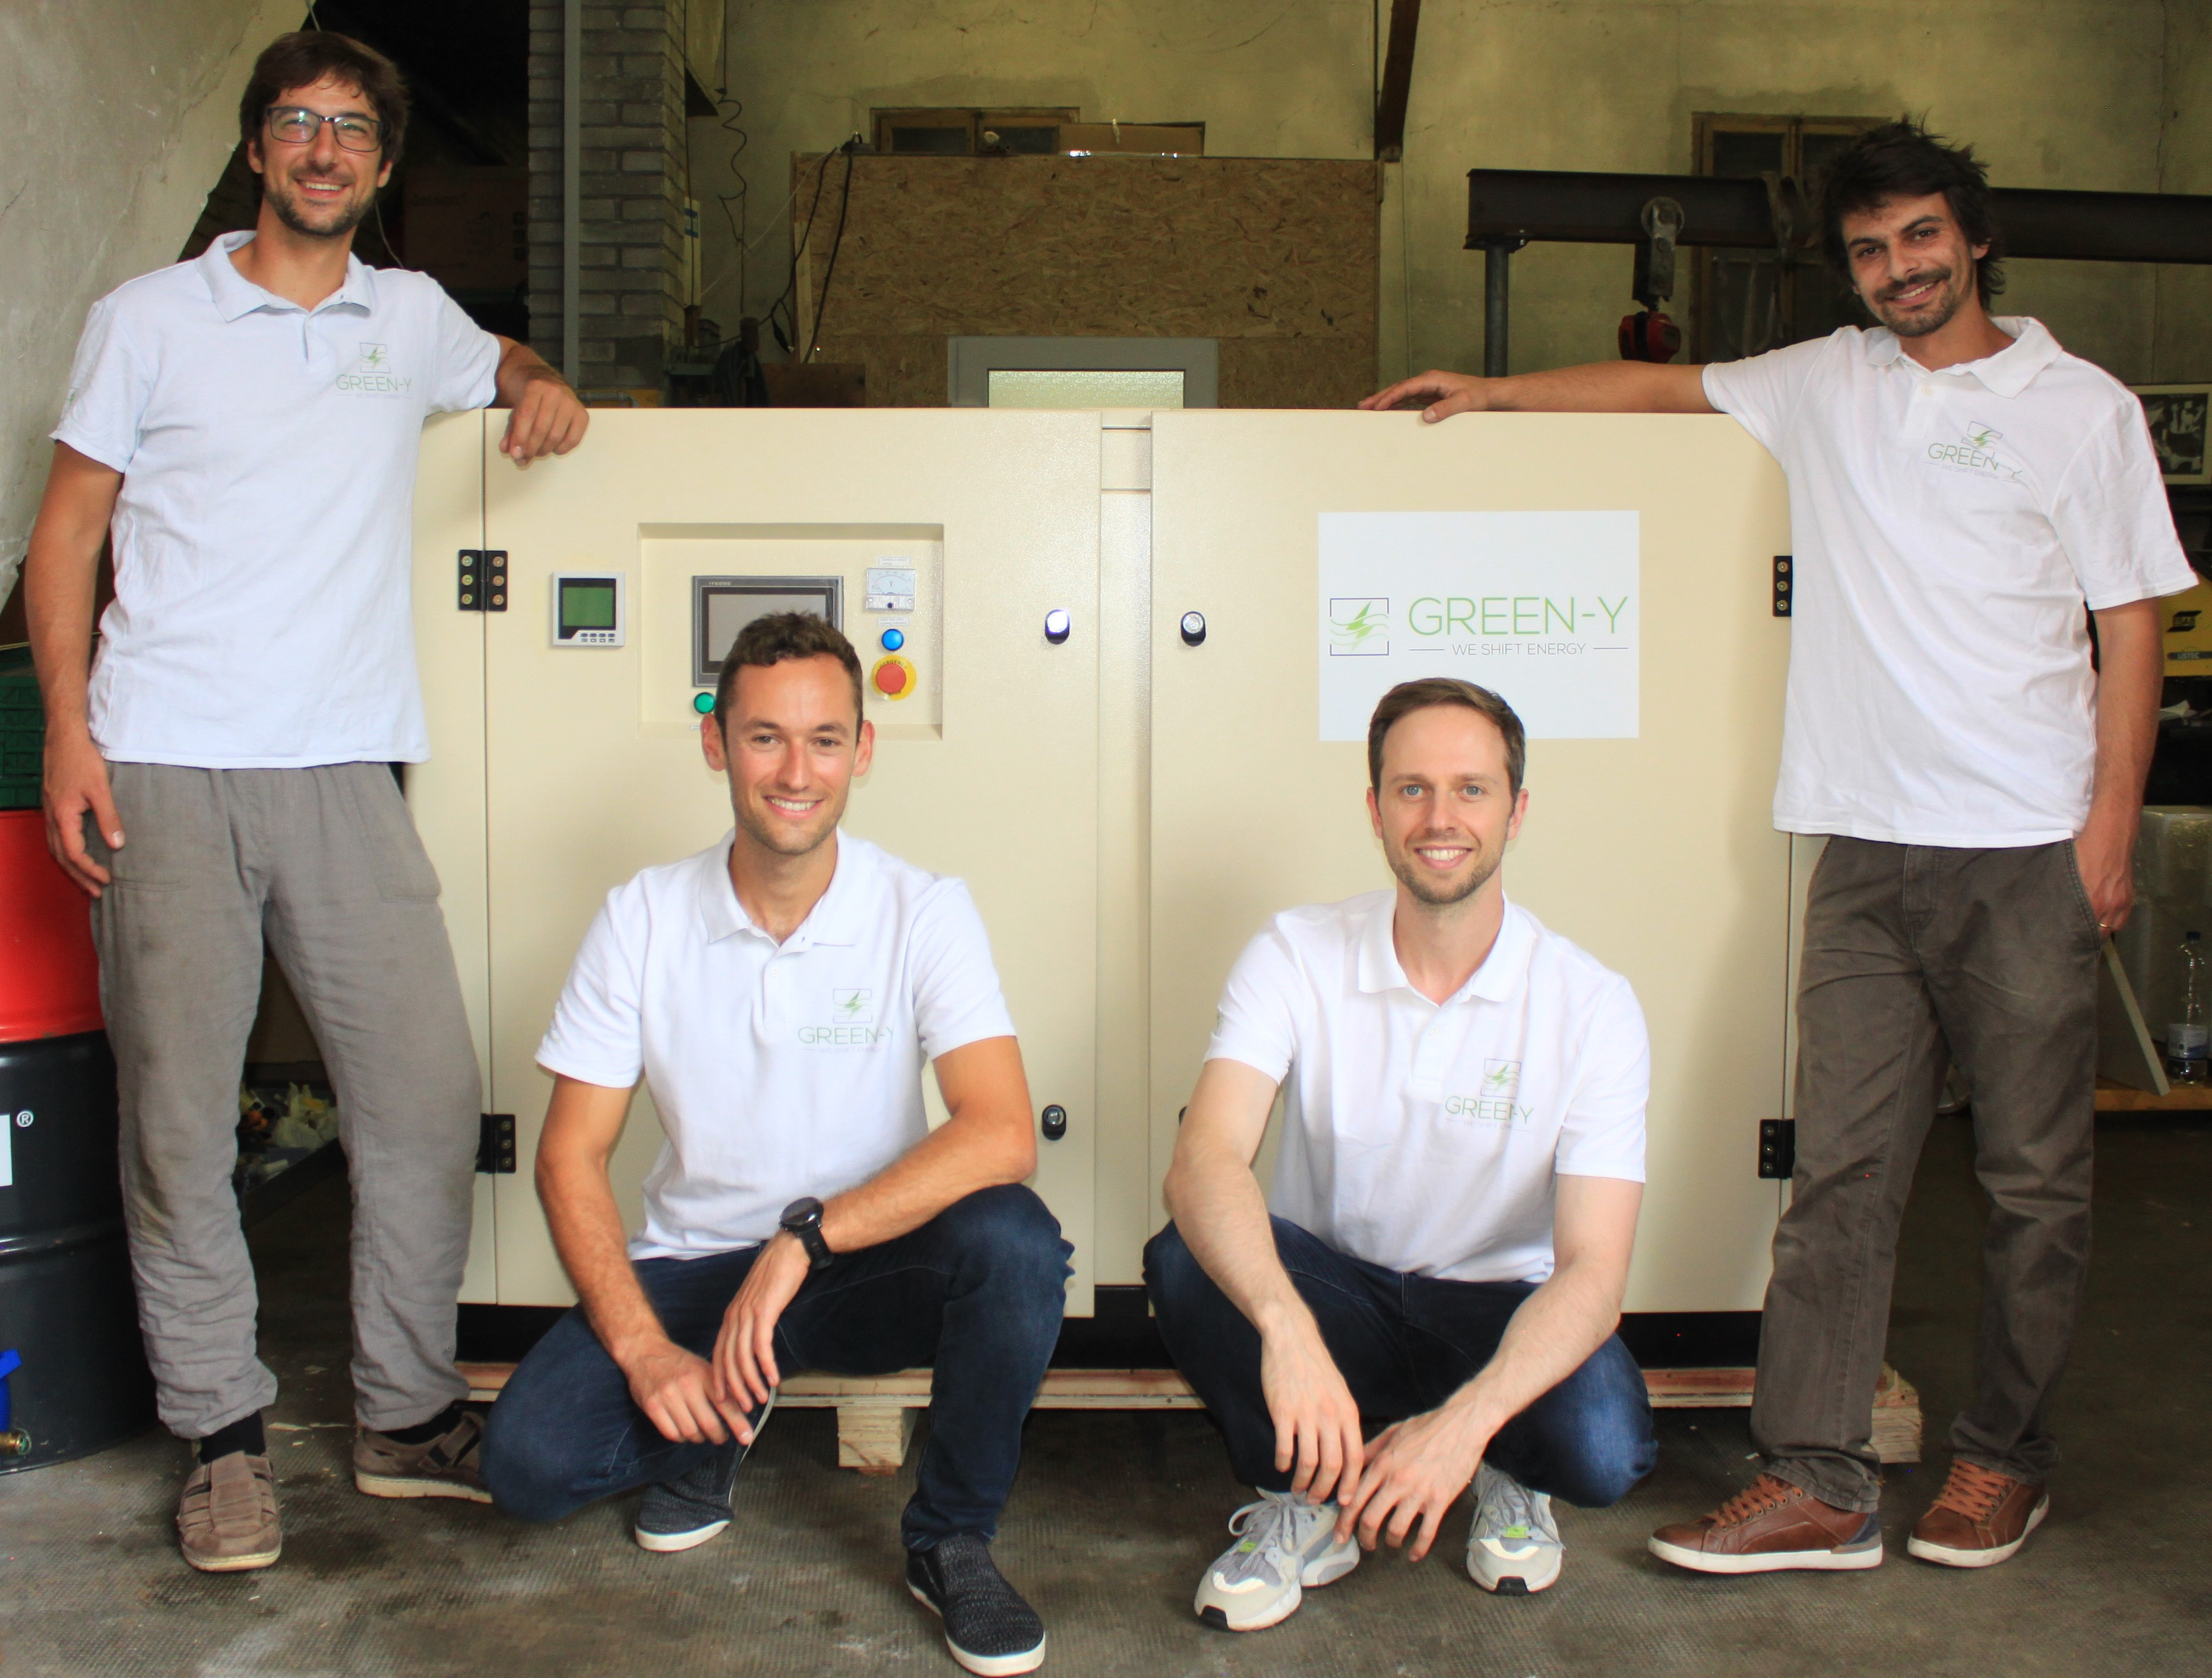 Green-Y Team. From left to right Patrick Baumann CTO, Dominik Schnarwiler COO, Peter Fritzen CFO, Rafik Barhaoumi CEO